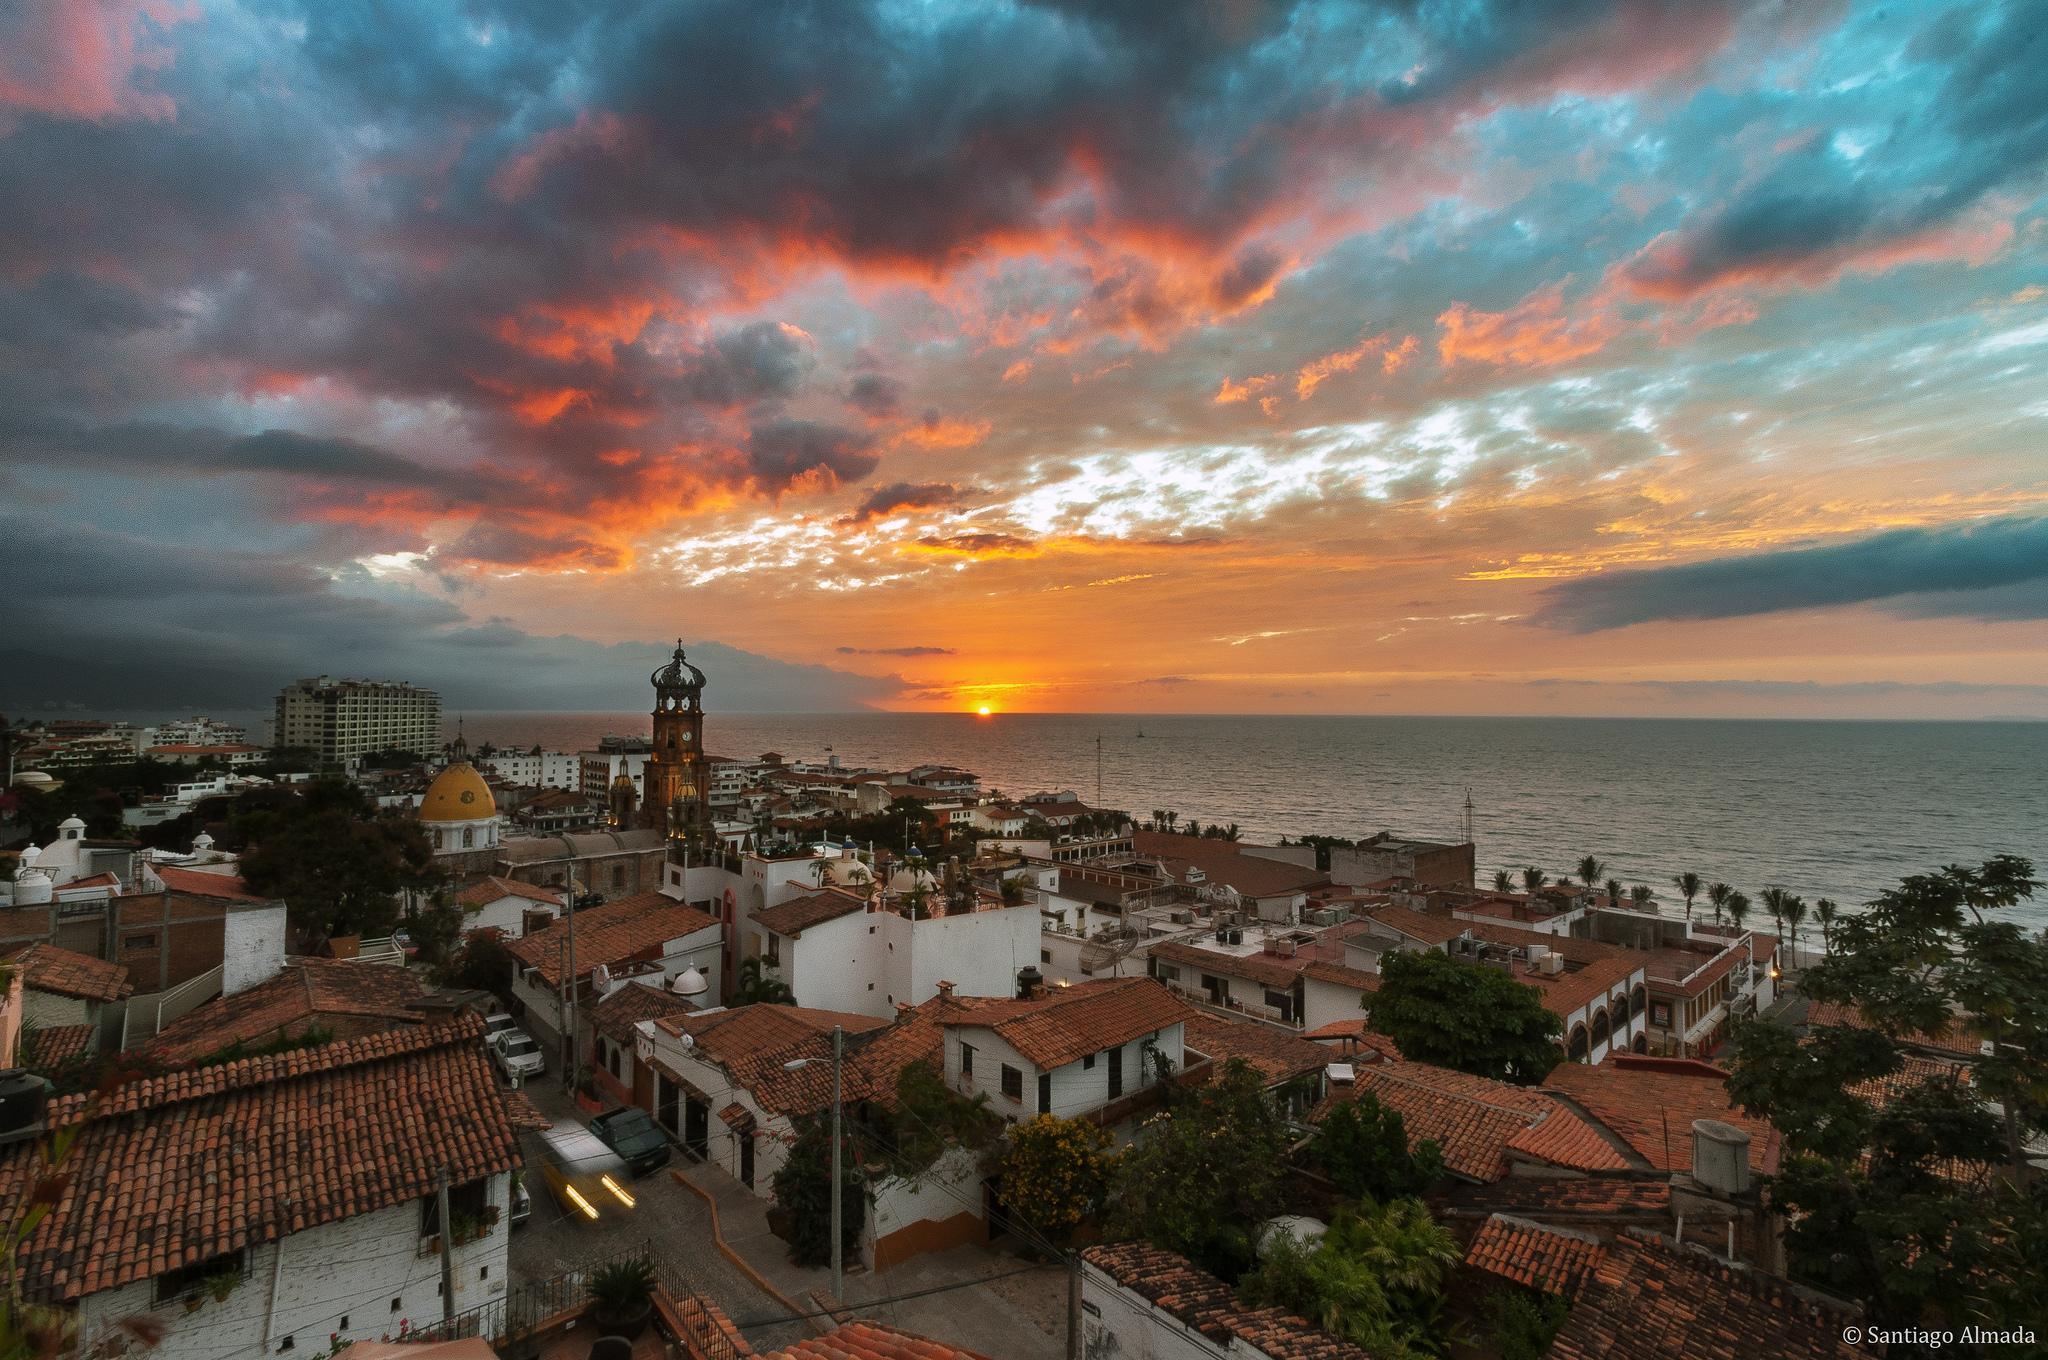 Top 10 Fabulous Things to Do in Puerto Vallarta